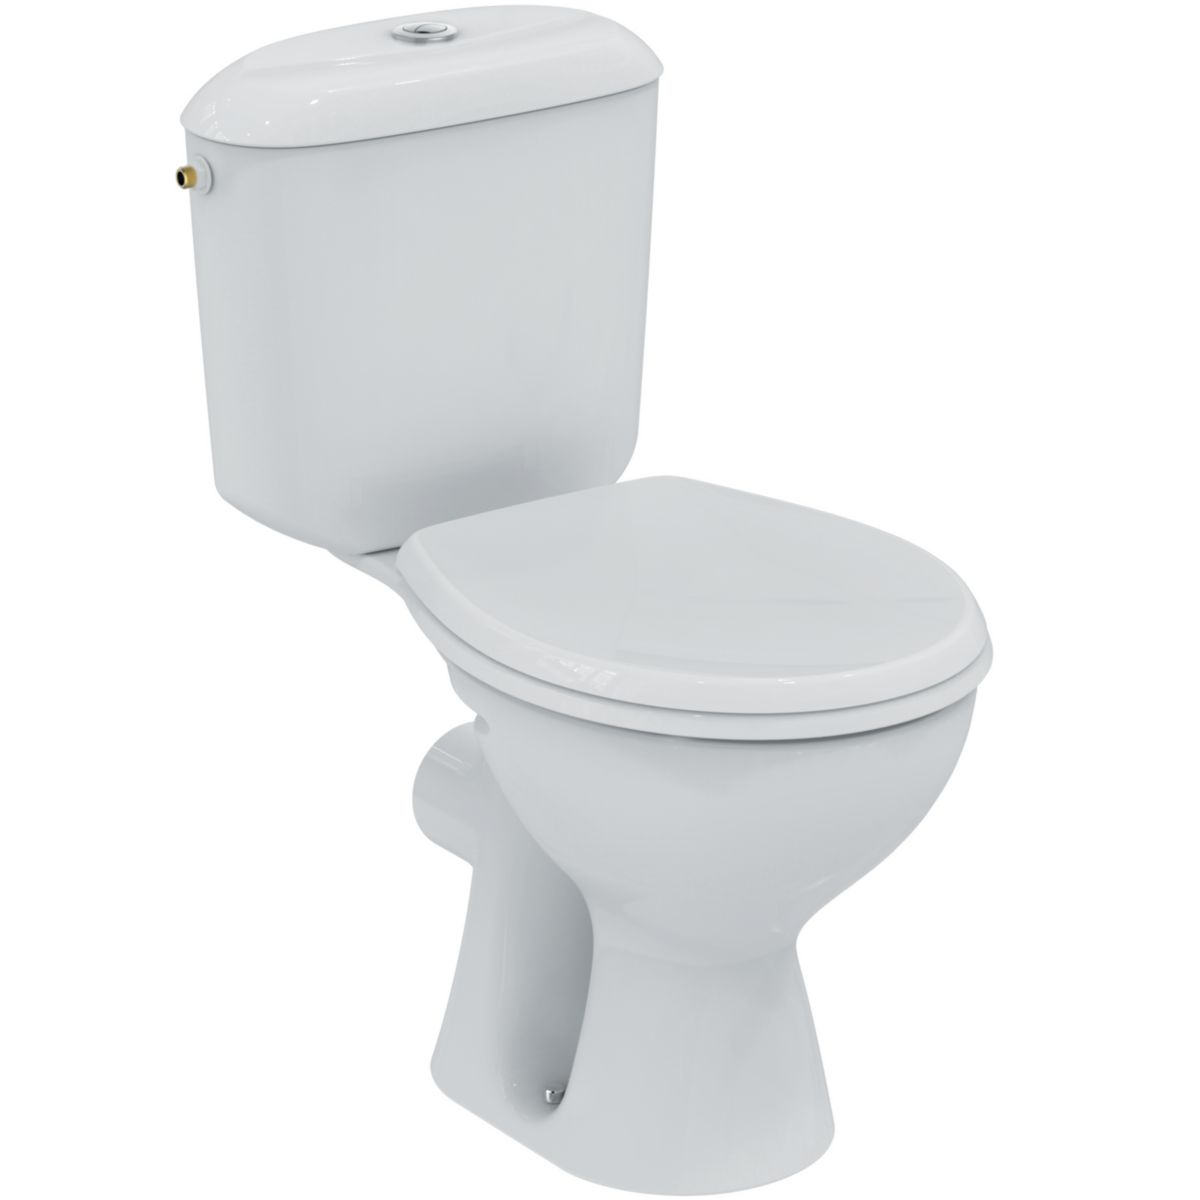 wc sortie verticale pas cher wc design sortie verticale avec wc sortie verticale latest wc. Black Bedroom Furniture Sets. Home Design Ideas